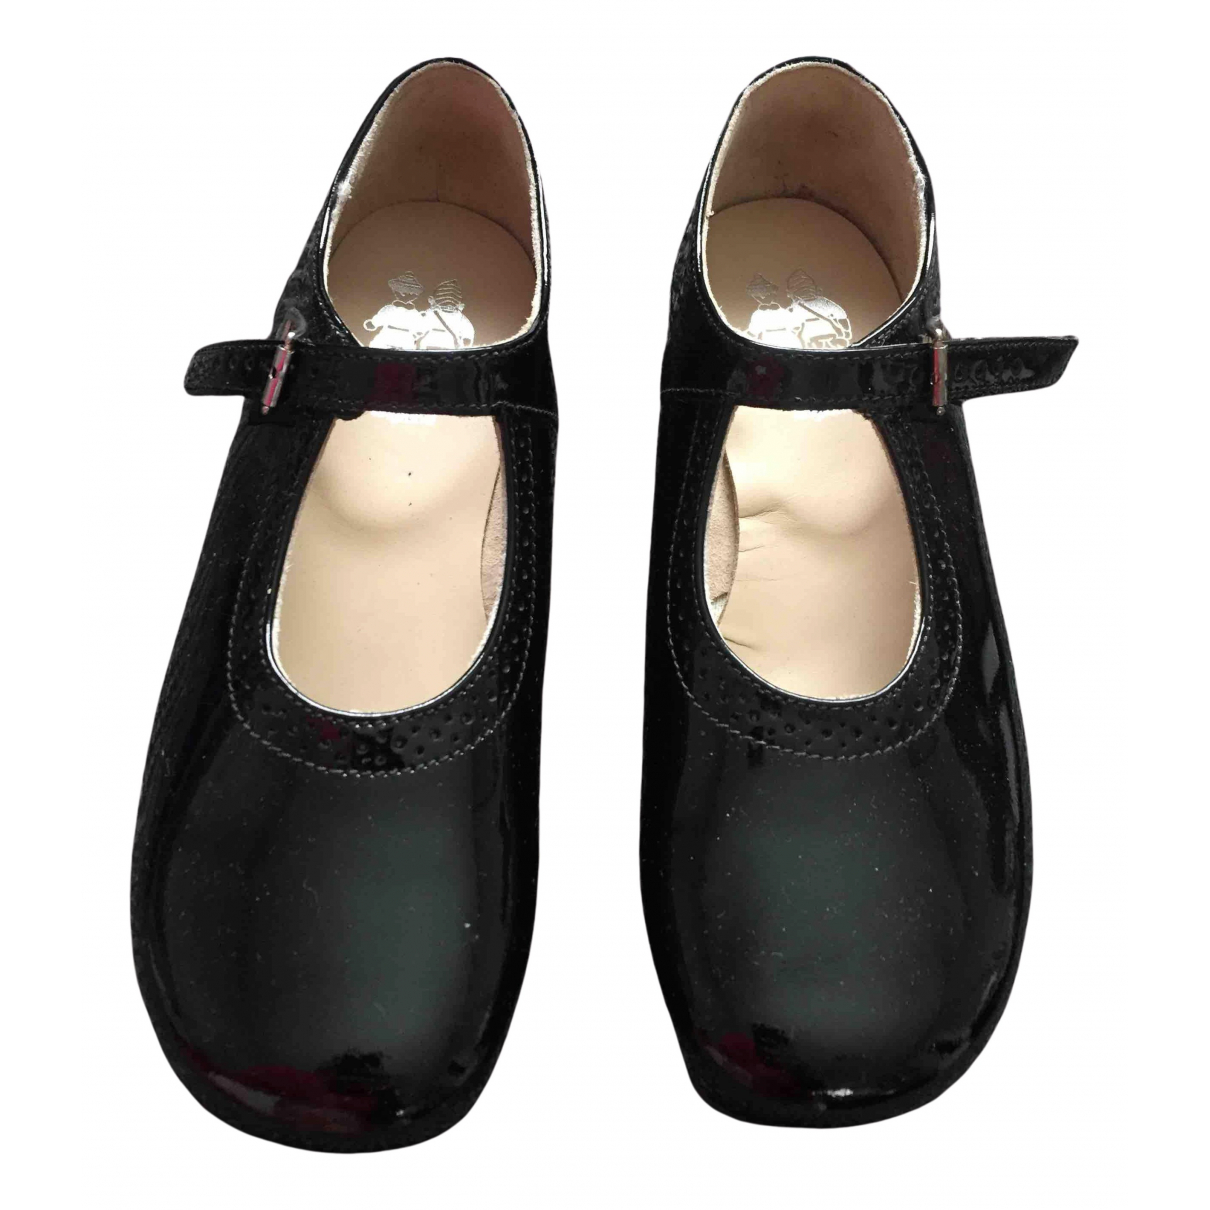 Start Rite N Black Patent leather Ballet flats for Kids 30 FR